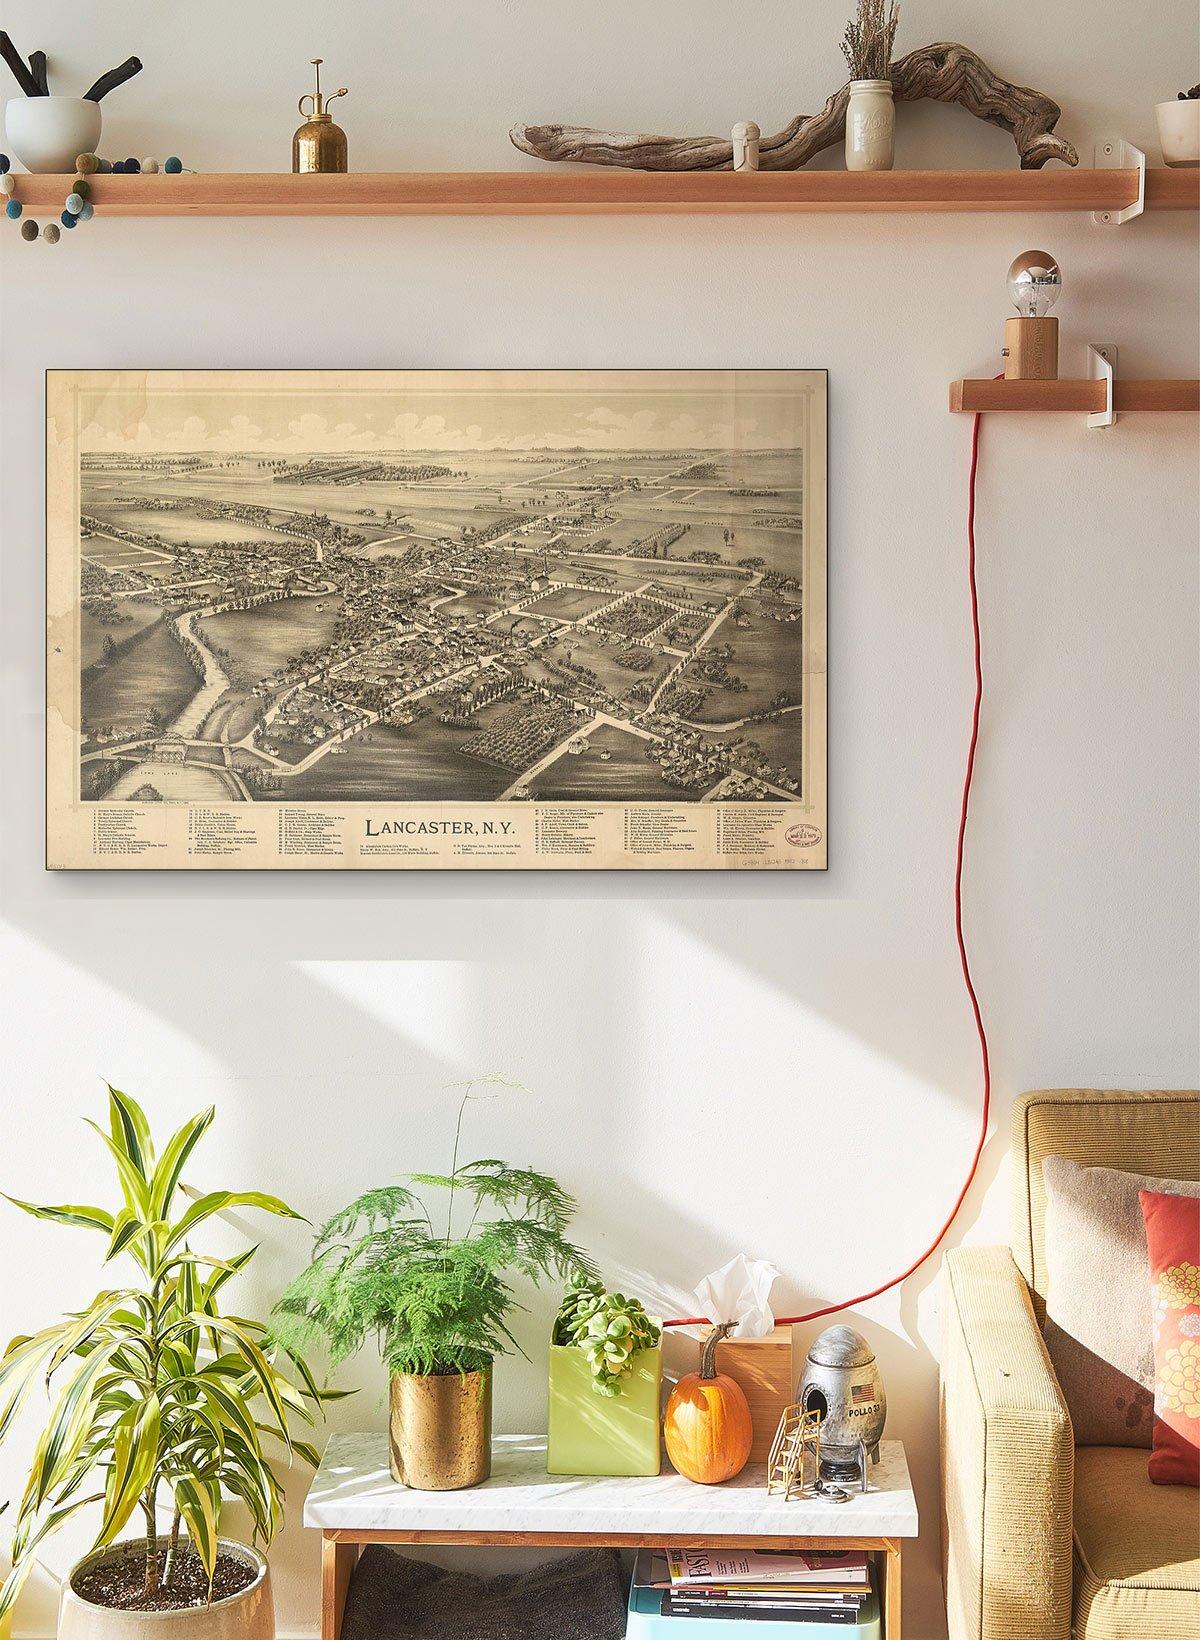 Lancaster N.y LARGE Vintage Map